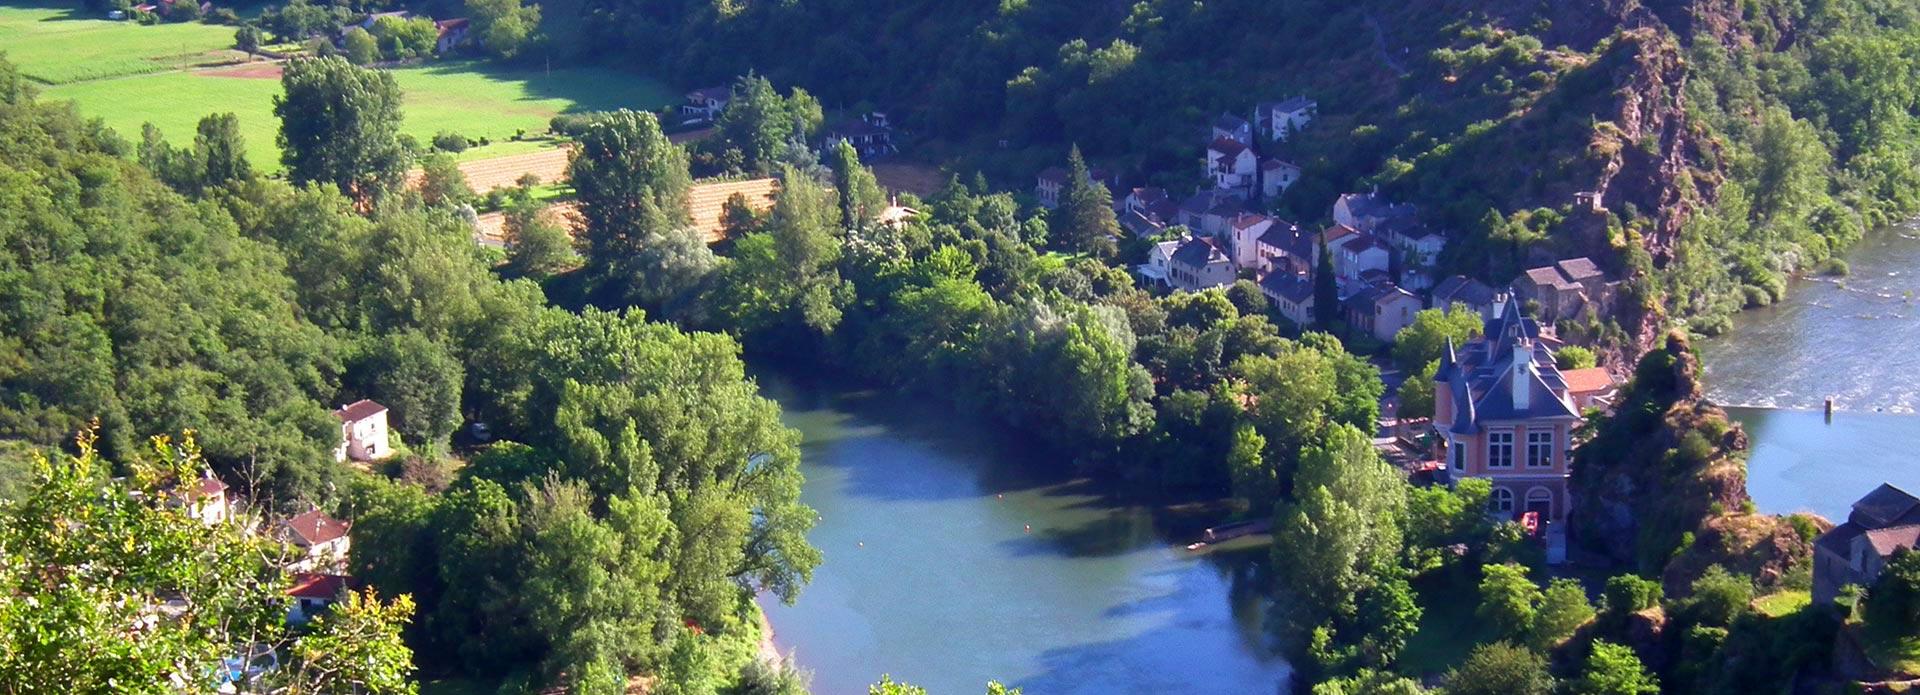 Découvez la Vallée du Tarn